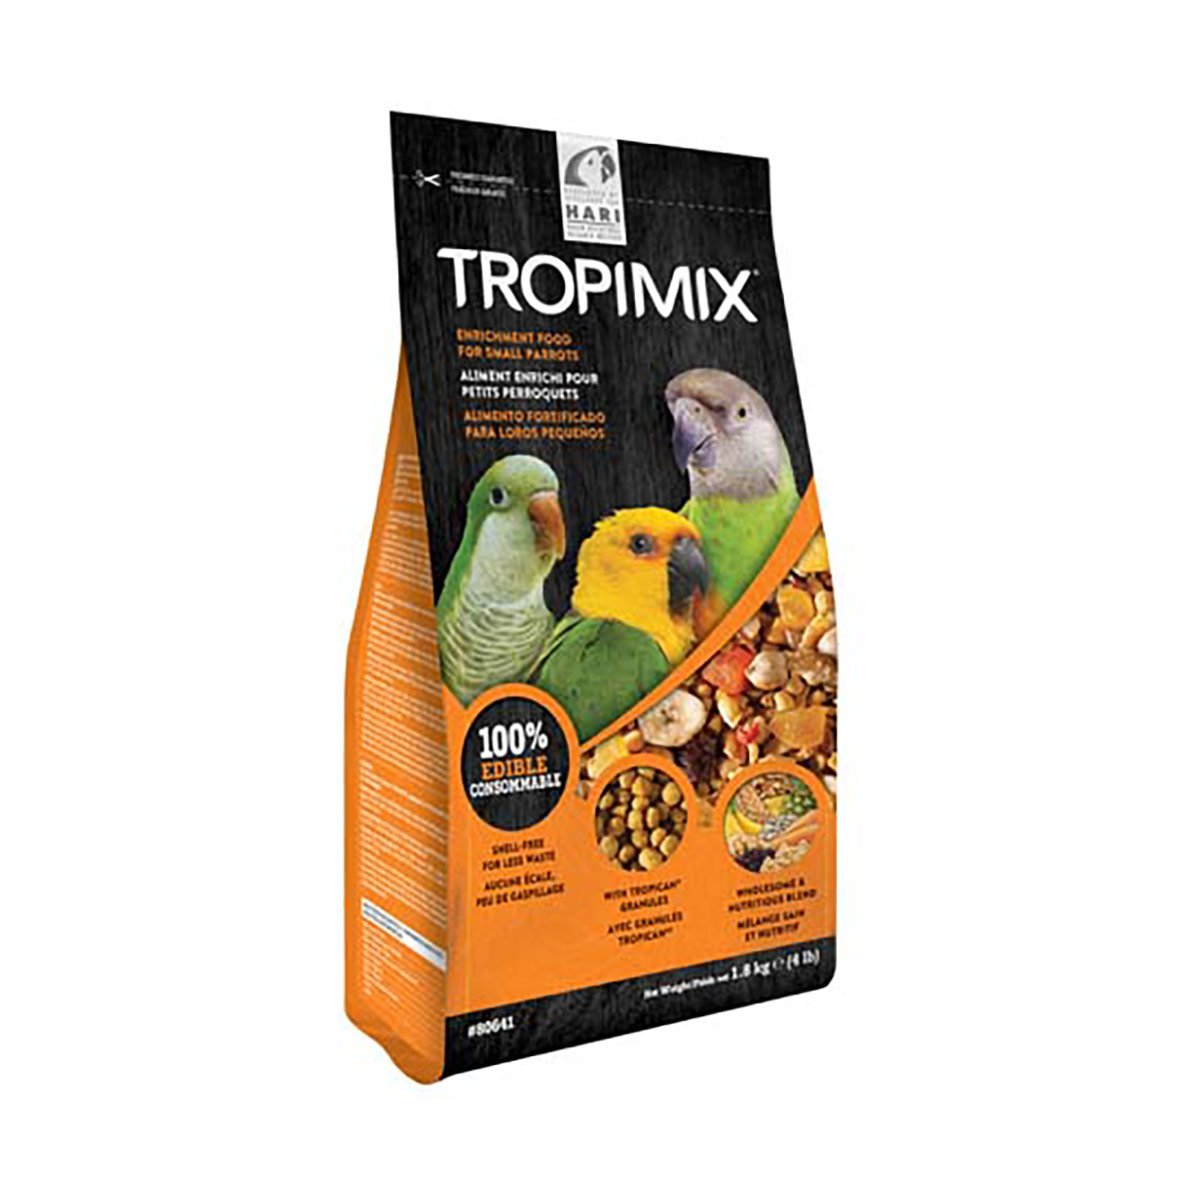 Image of Hari Tropimix per Pappagalli Piccoli : 1,8 kg